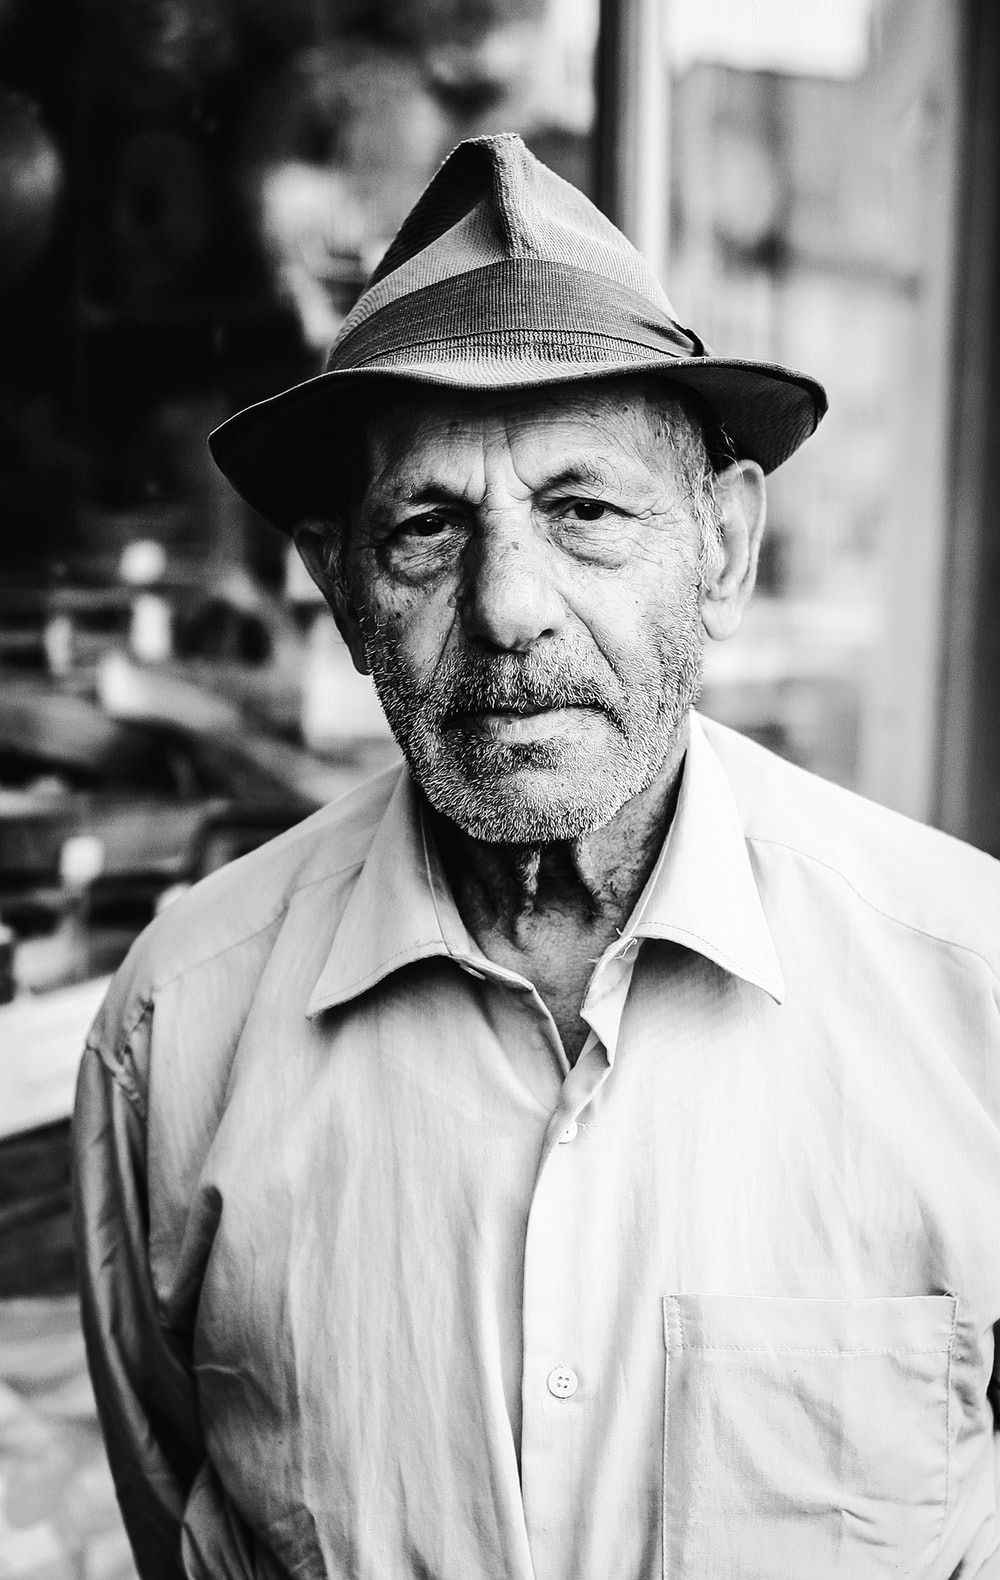 grayscale photography of man wearing dress shirt